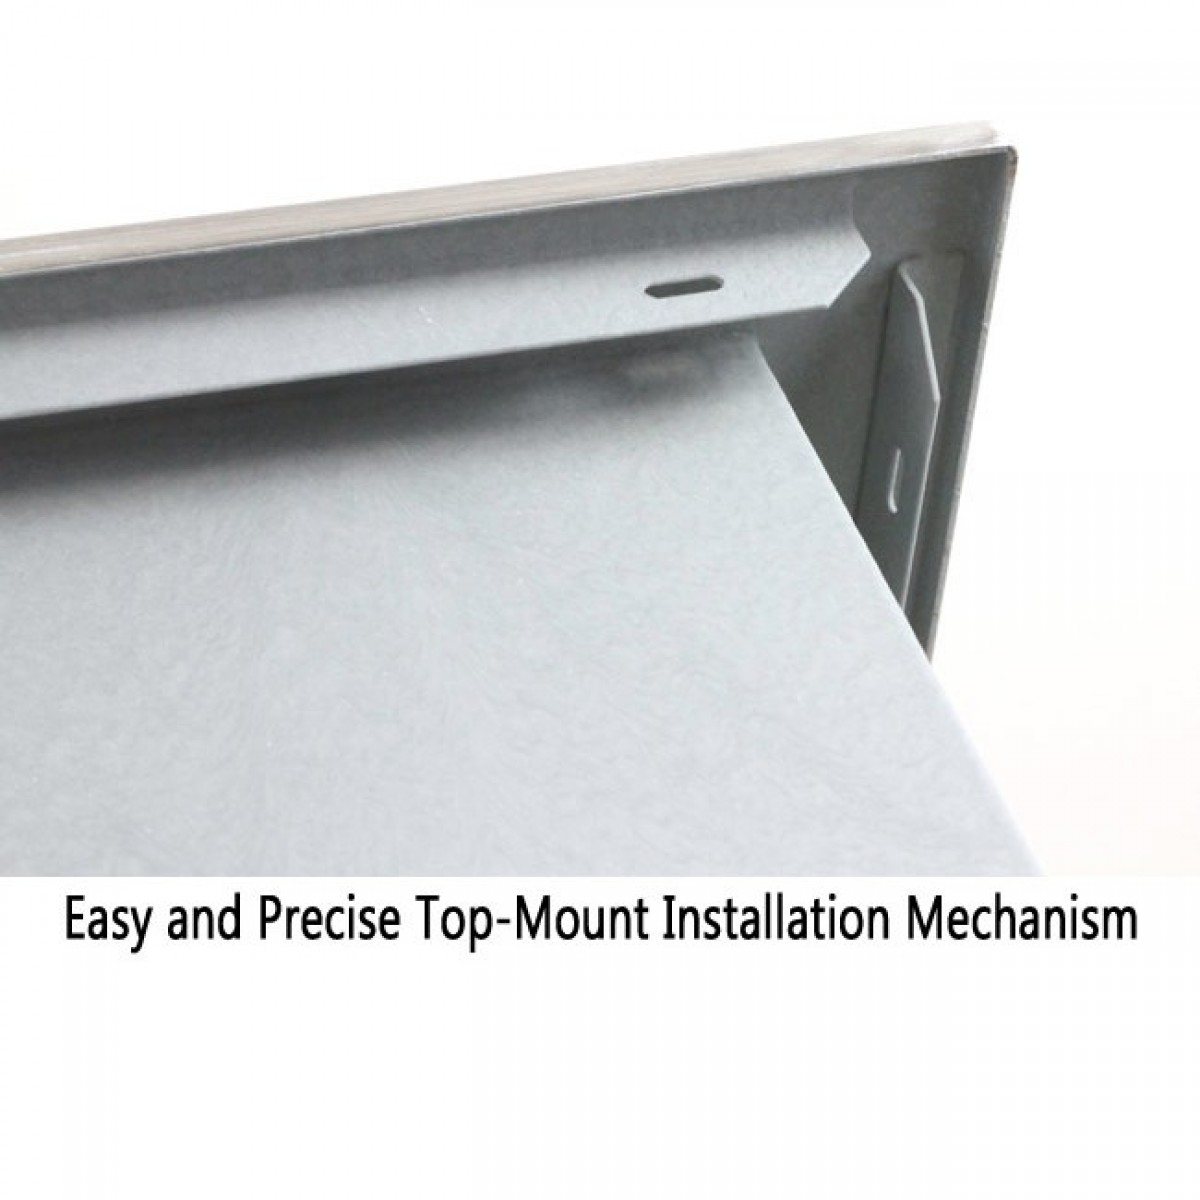 Stainless steel single bowl topmount drop in zero radius kitchen sink - Regular Price 800 00